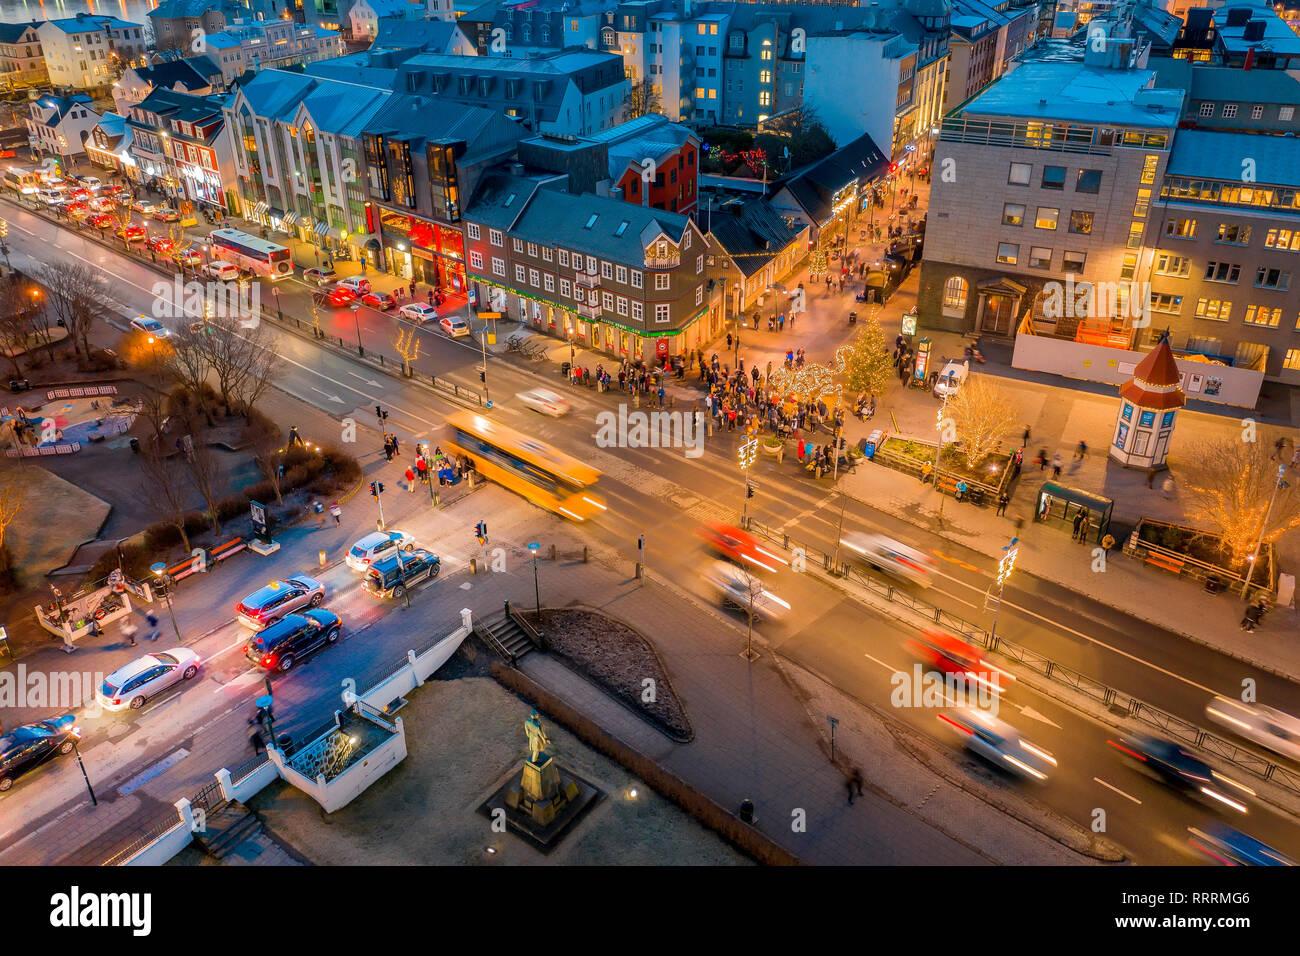 Christmas celebrations, Reykjavik, Iceland Stock Photo